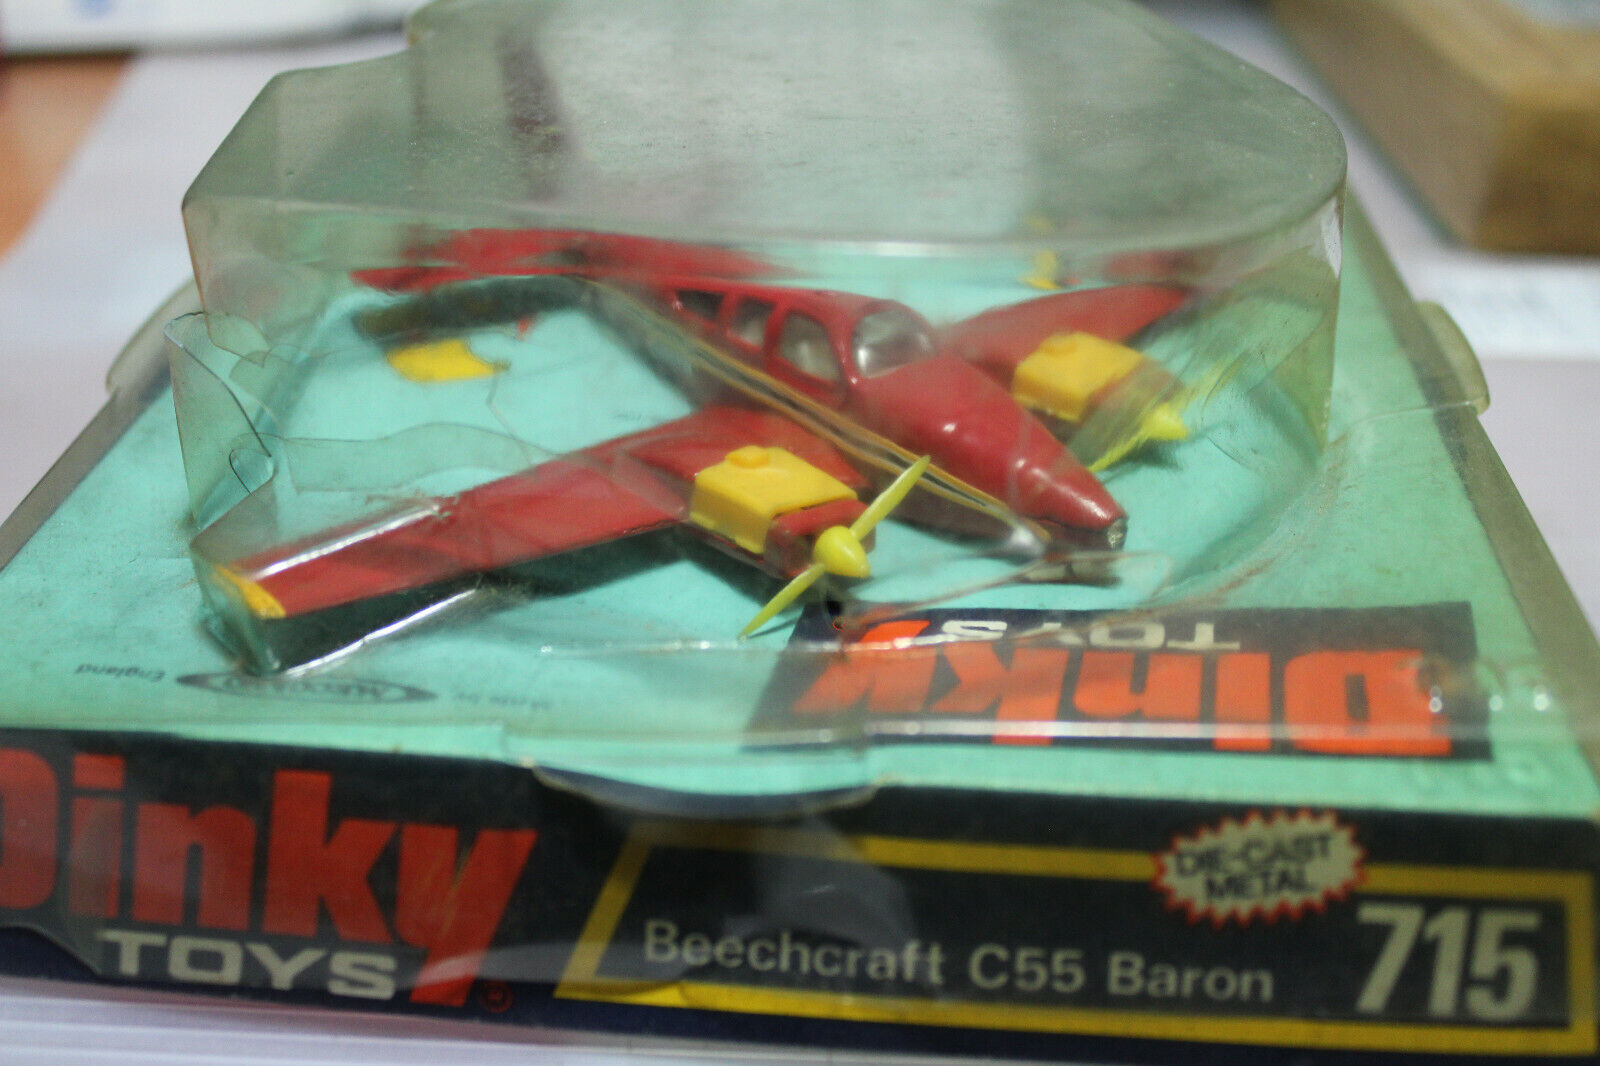 DINKY TOYS GB AVION BEECHCRAFT C55 BARON NEUF BOITE